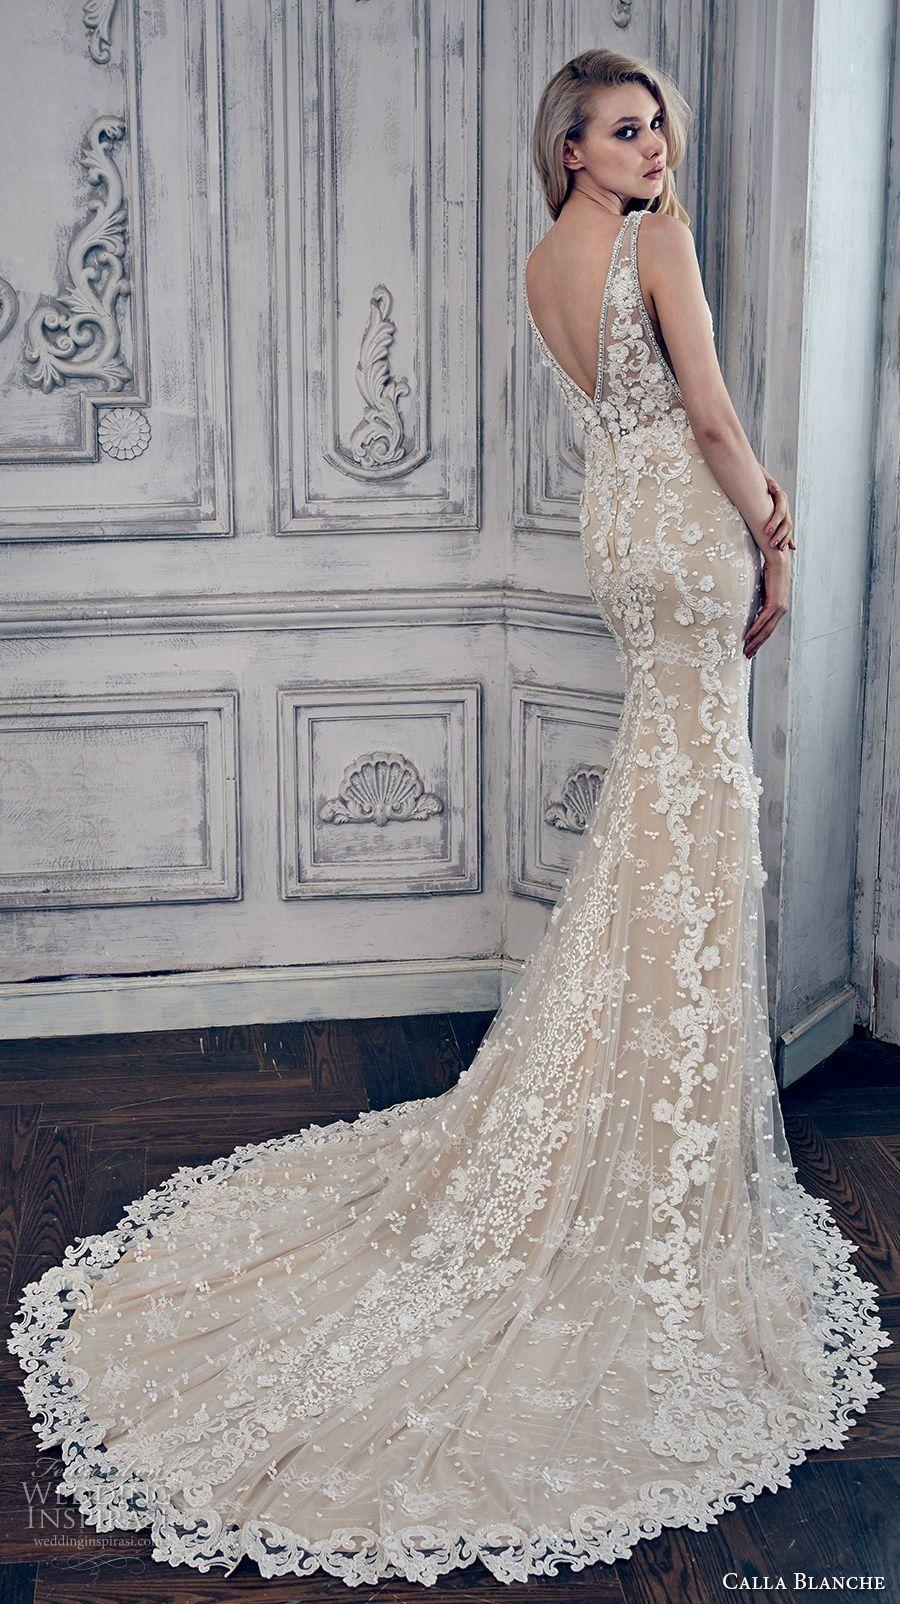 Wedding dress with color  calla blanche spring  bridal sleeveless deep v neckline full